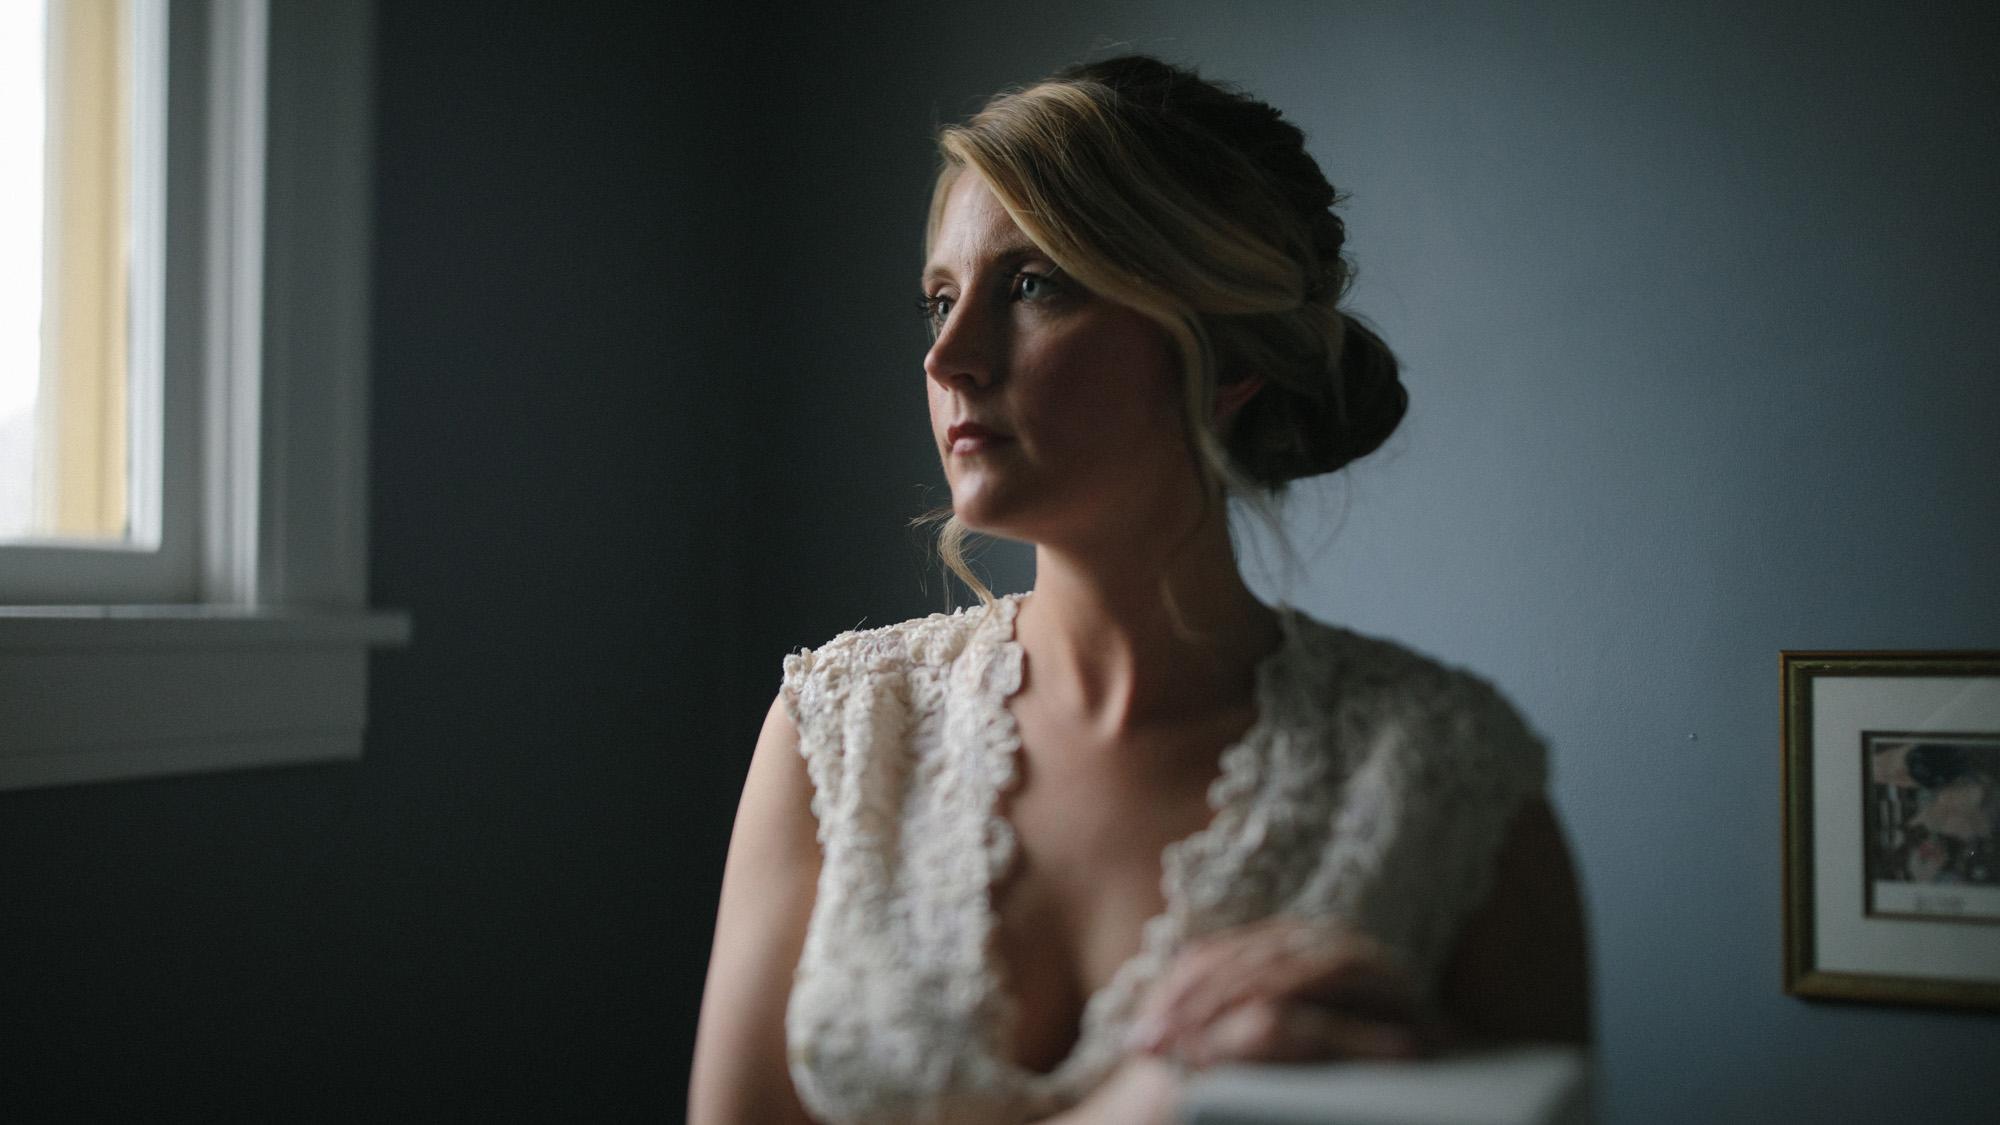 Alec_Vanderboom_kansas_city_hip_wedding_photos-0015.jpg